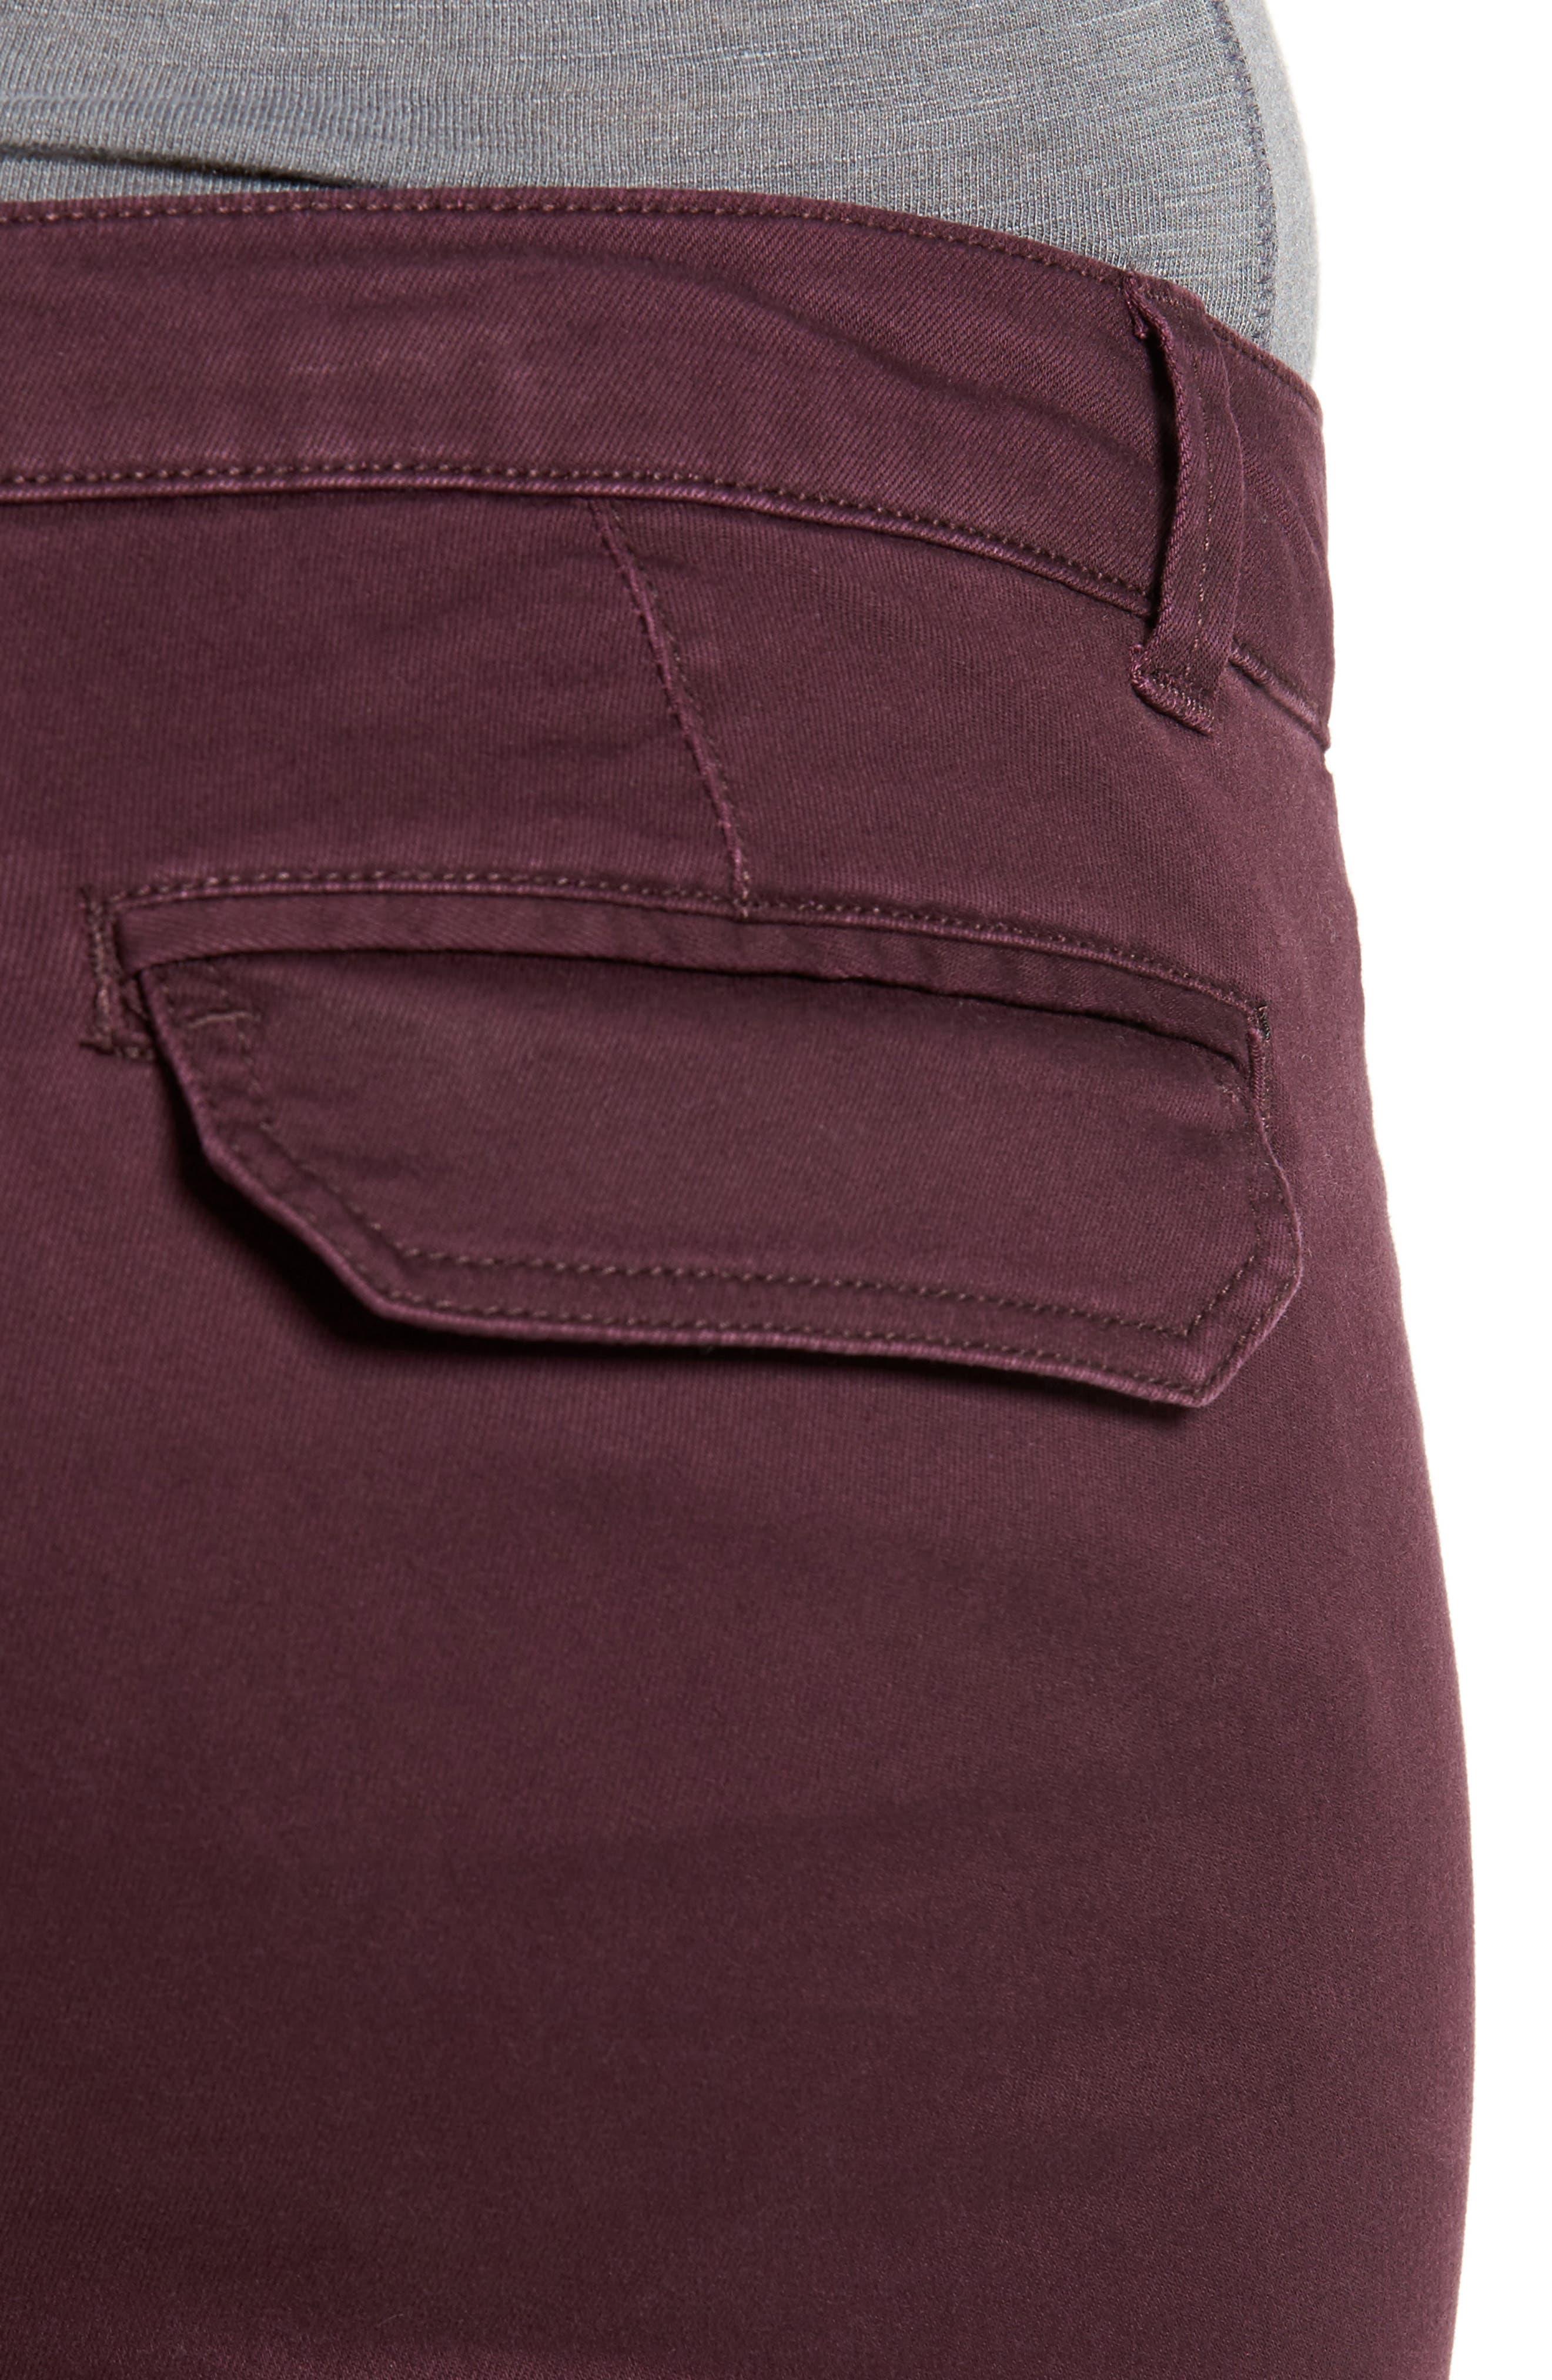 Skinny Cargo Pants,                             Alternate thumbnail 52, color,